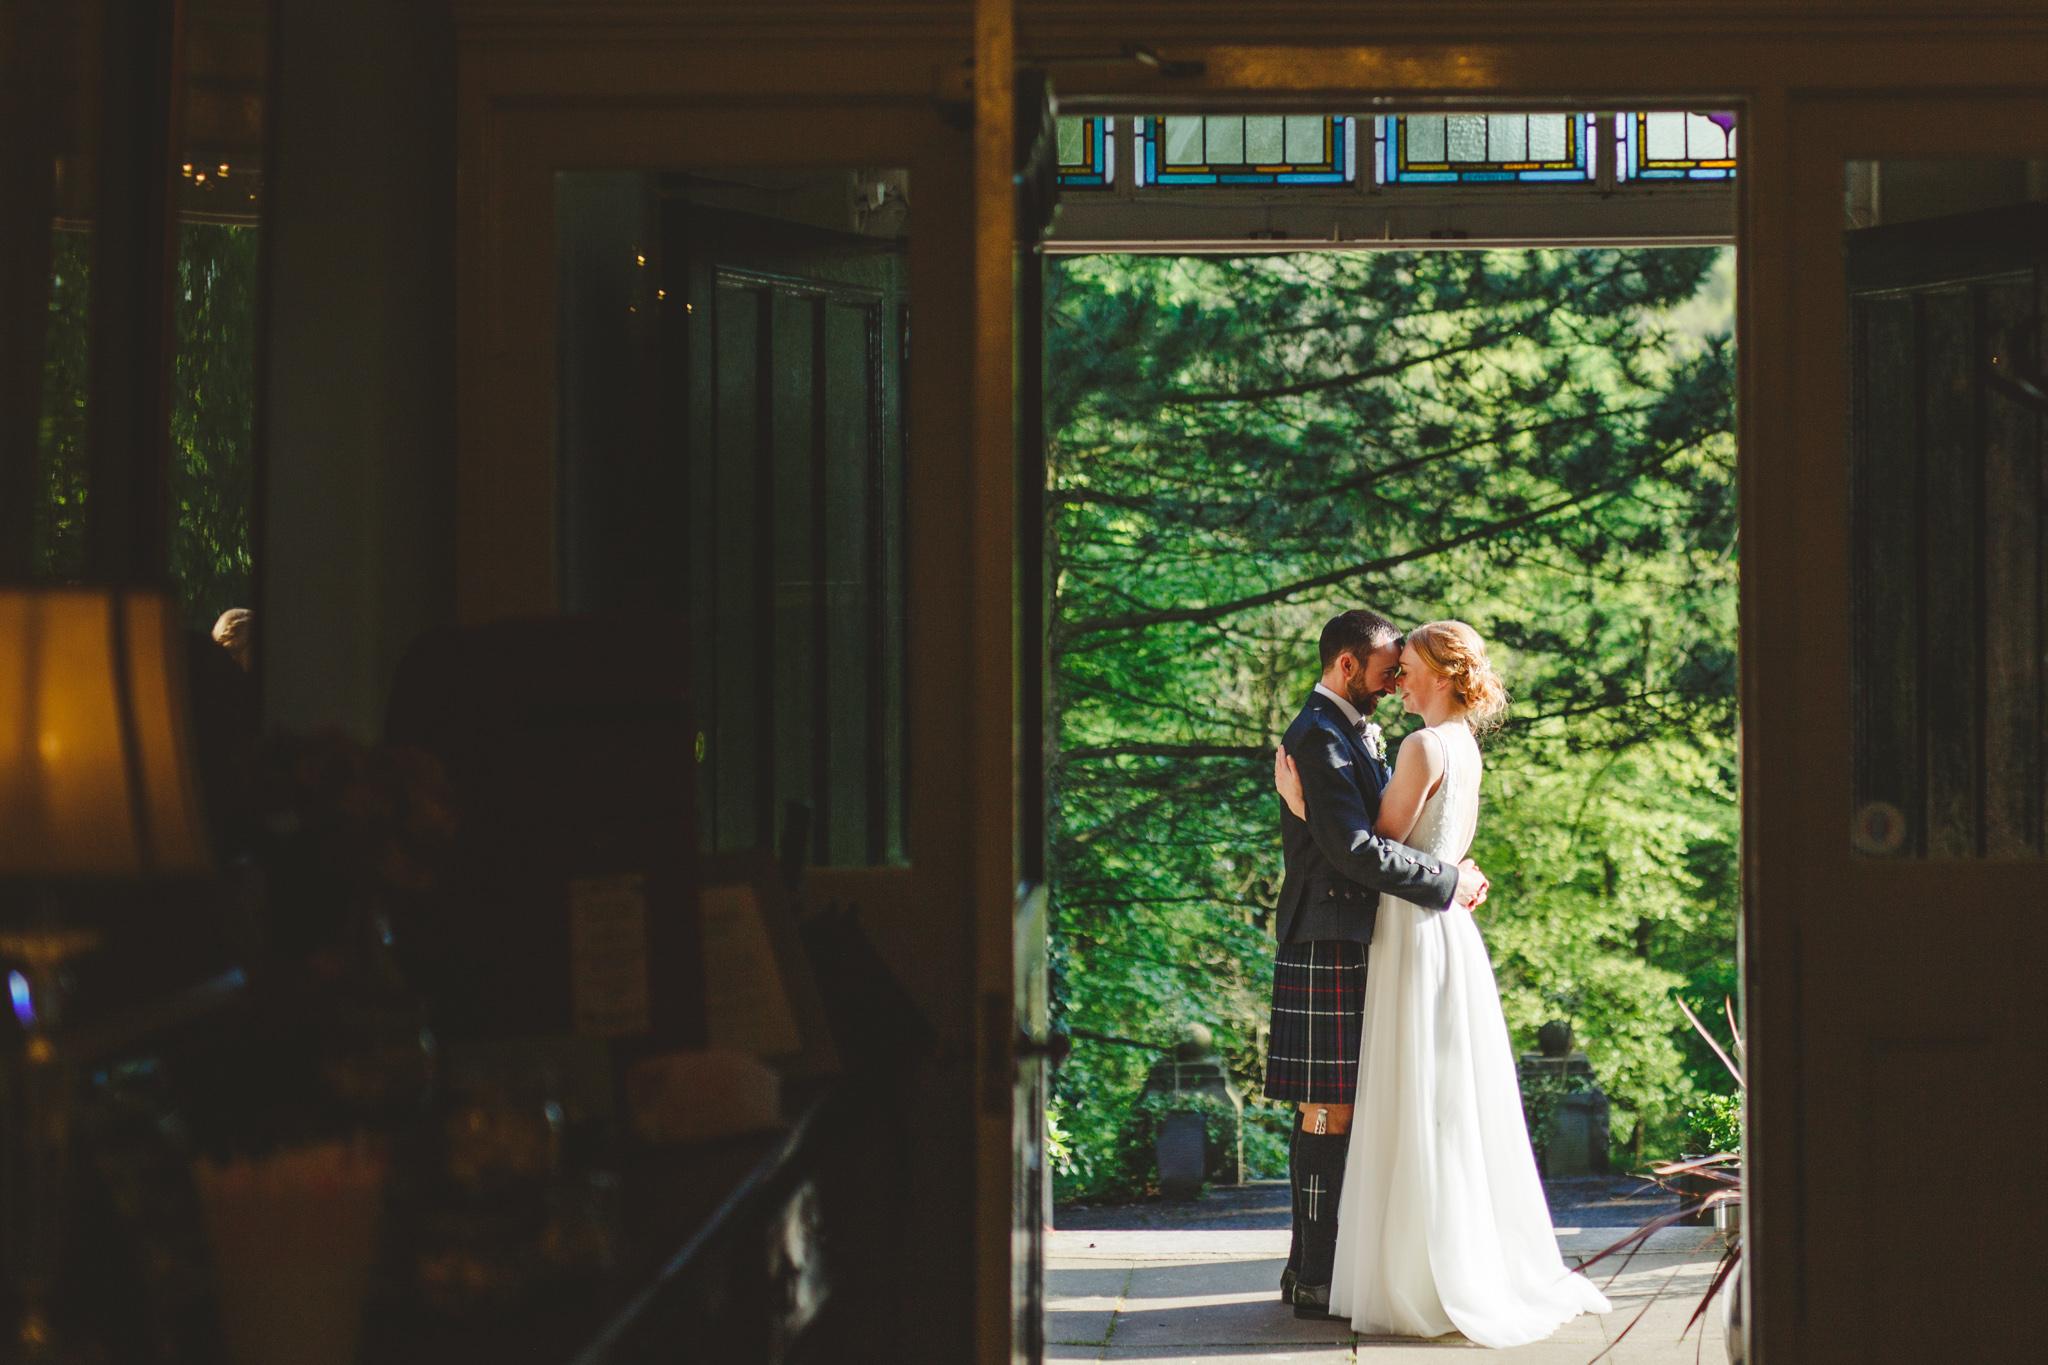 derbyshire-wedding-photographer-videographer-camera-hannah-56.jpg